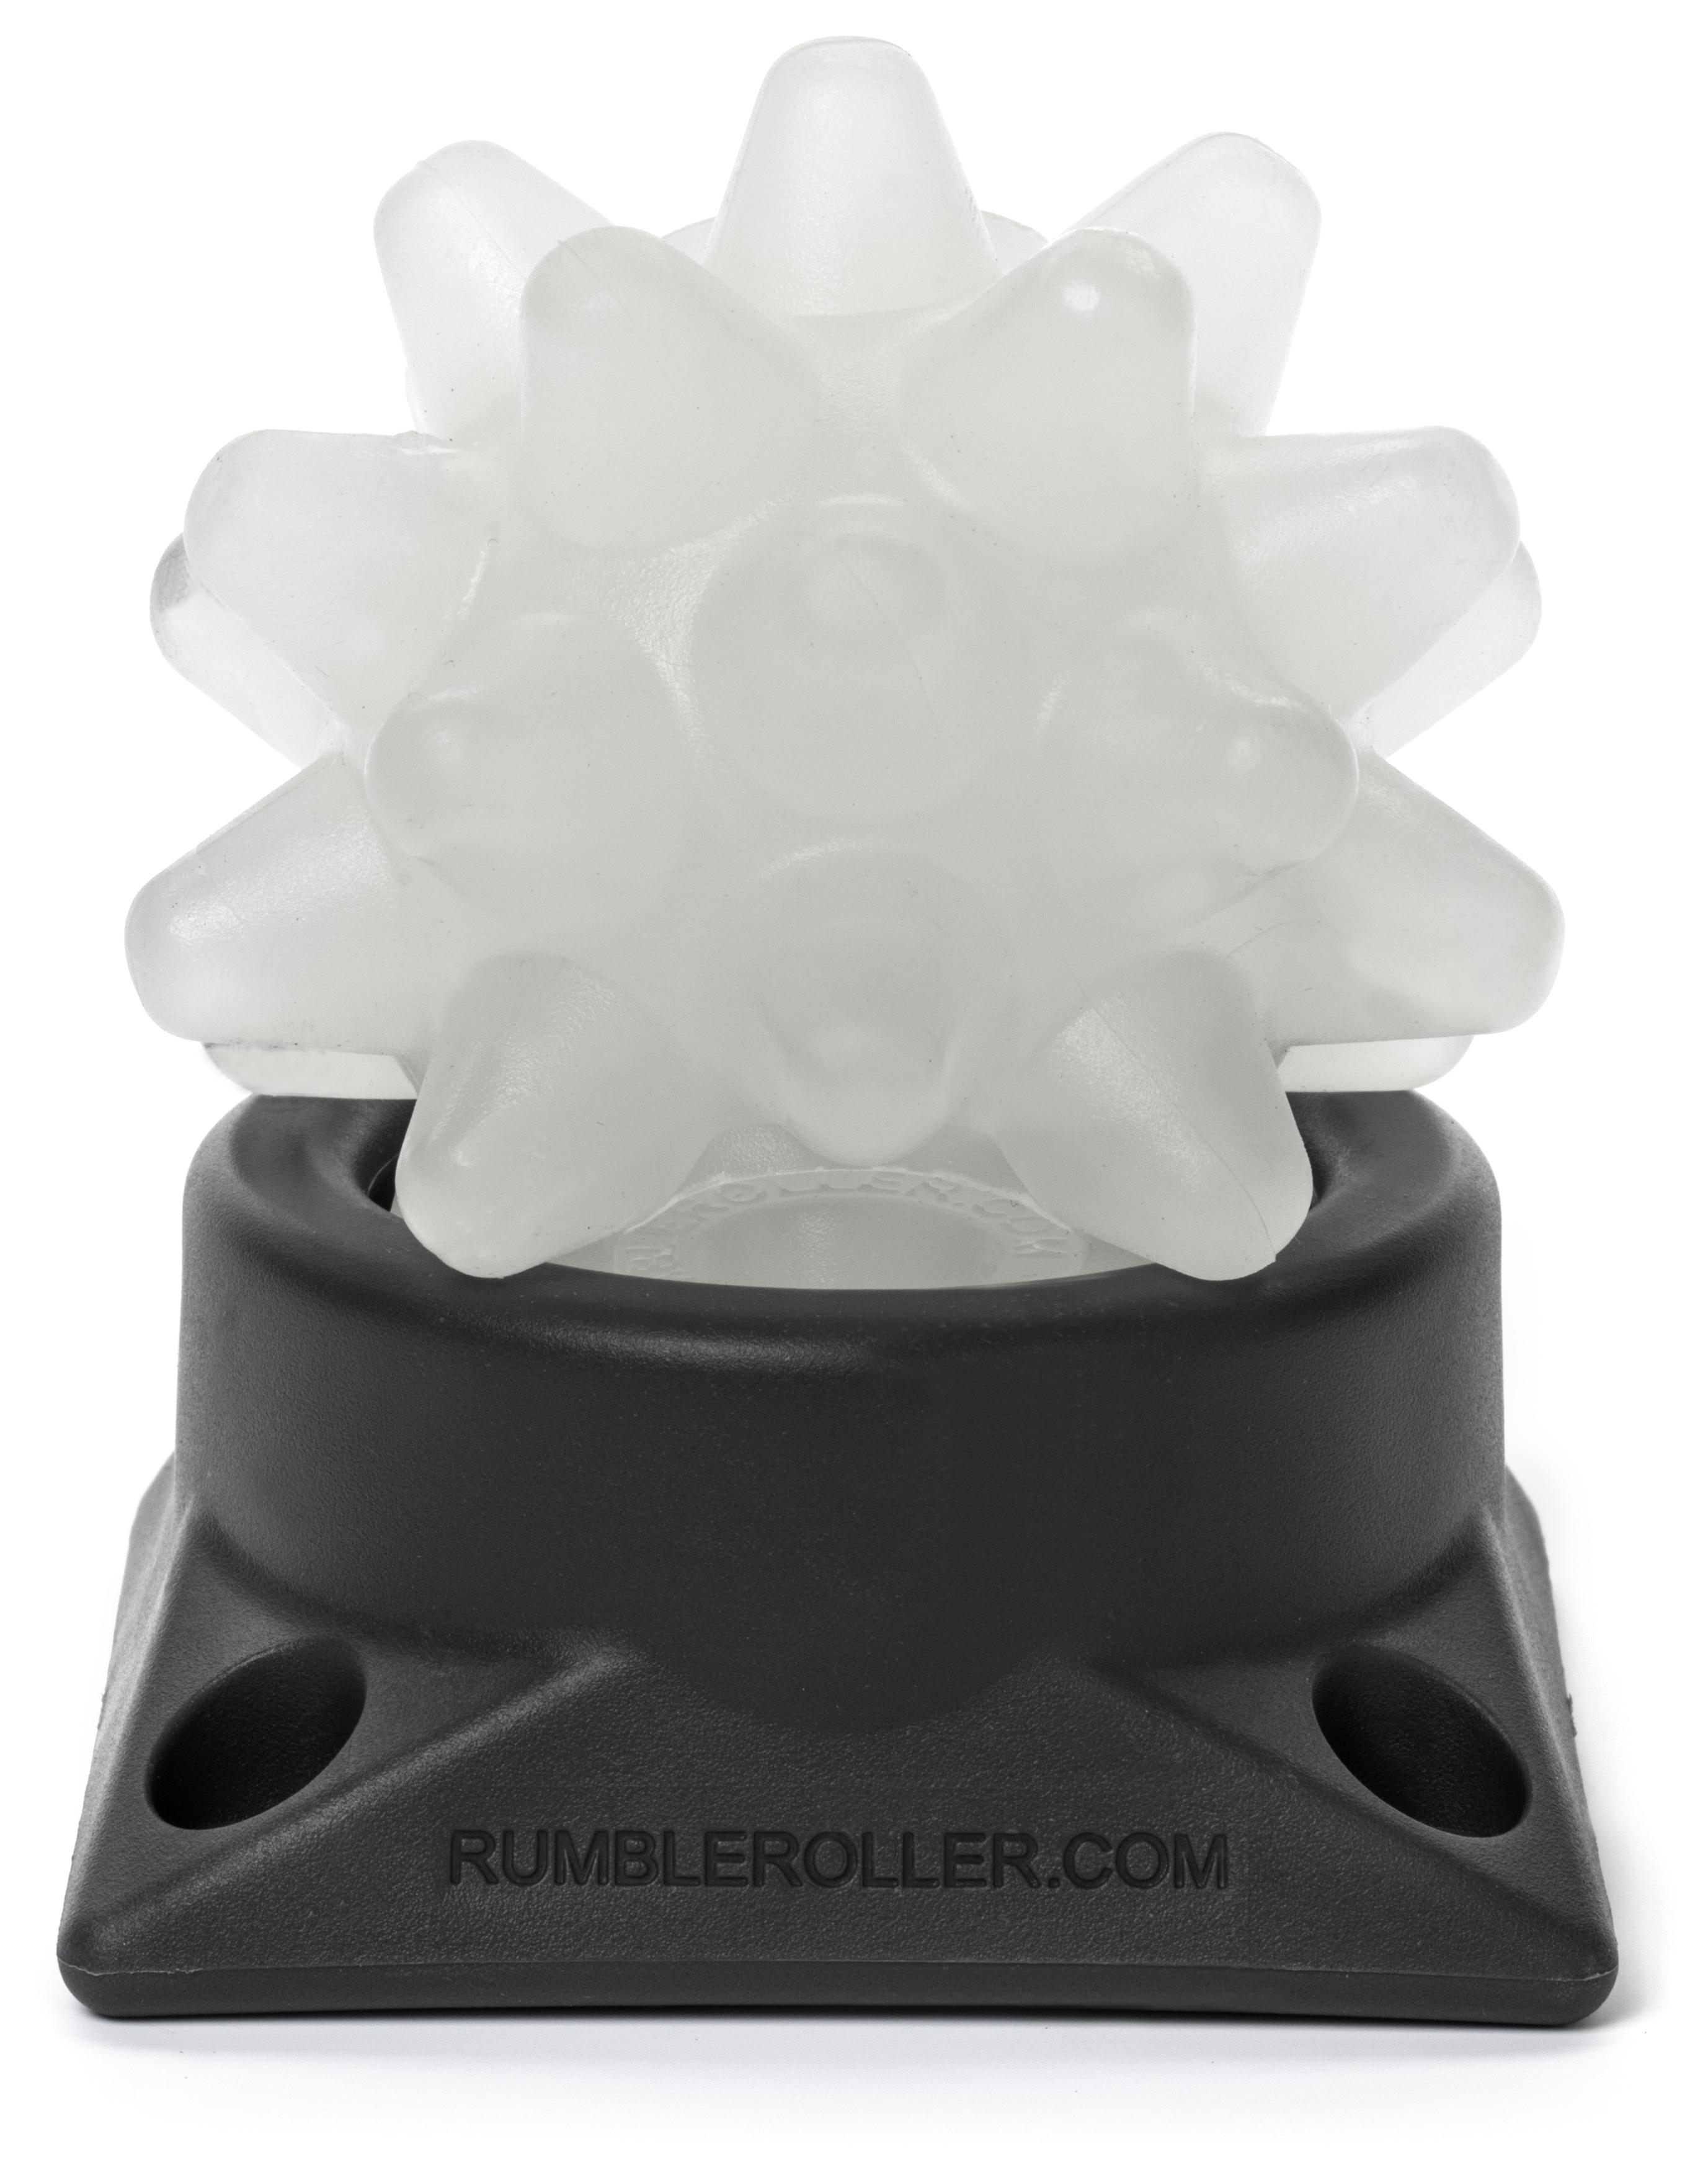 RumbleRoller® Beastie Ball - Original